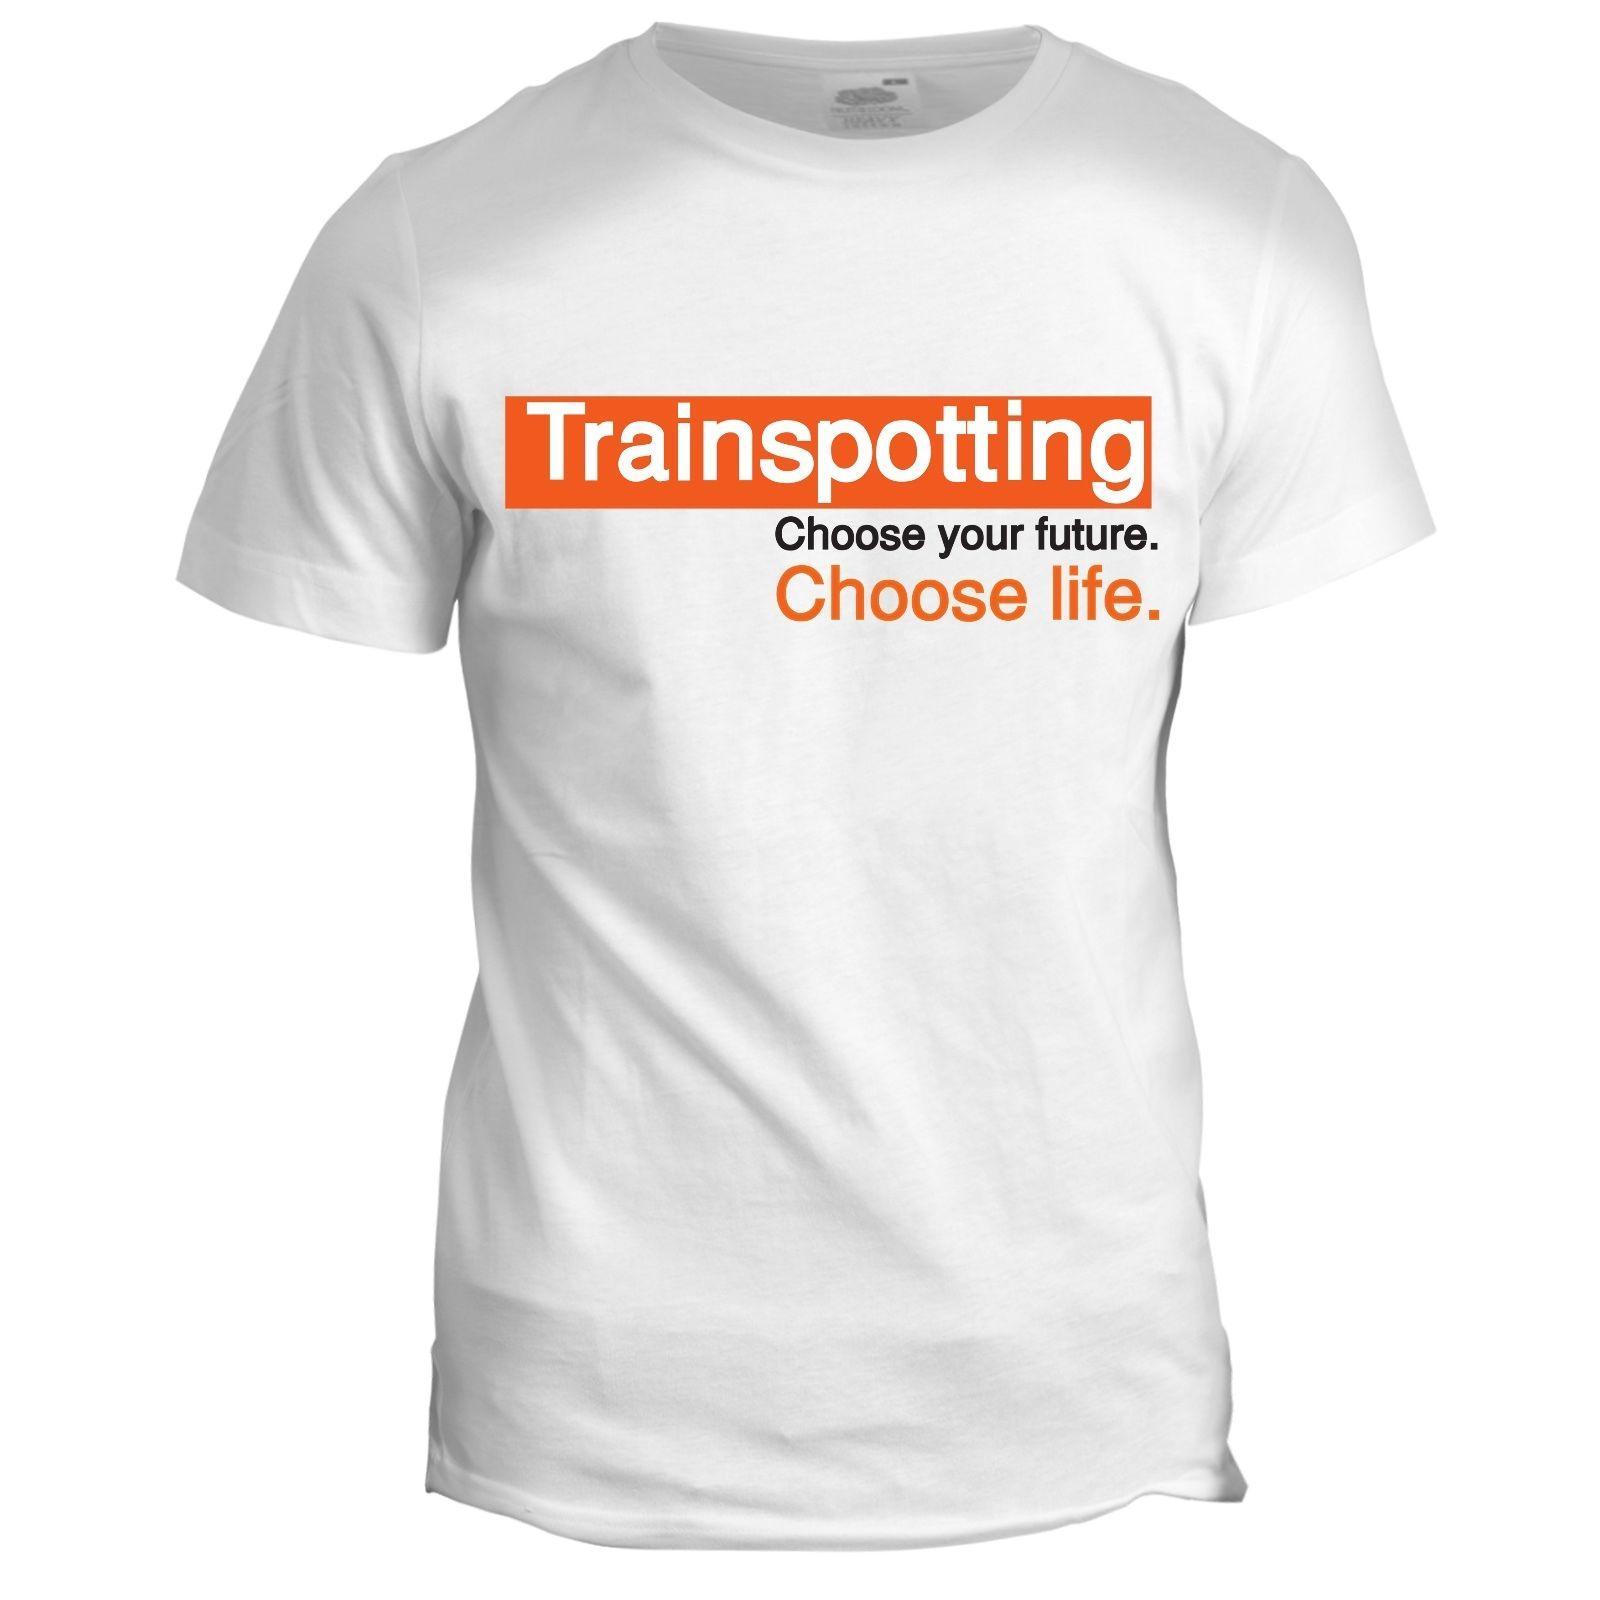 980abdda04b 2017 New Short Sleeve Casual T Shirt Tee Trainspotting Inspired Film Movie  Mens Tumblr 90s Choose Life T Shirt T Shirs T Shirst From Bstdhgate04